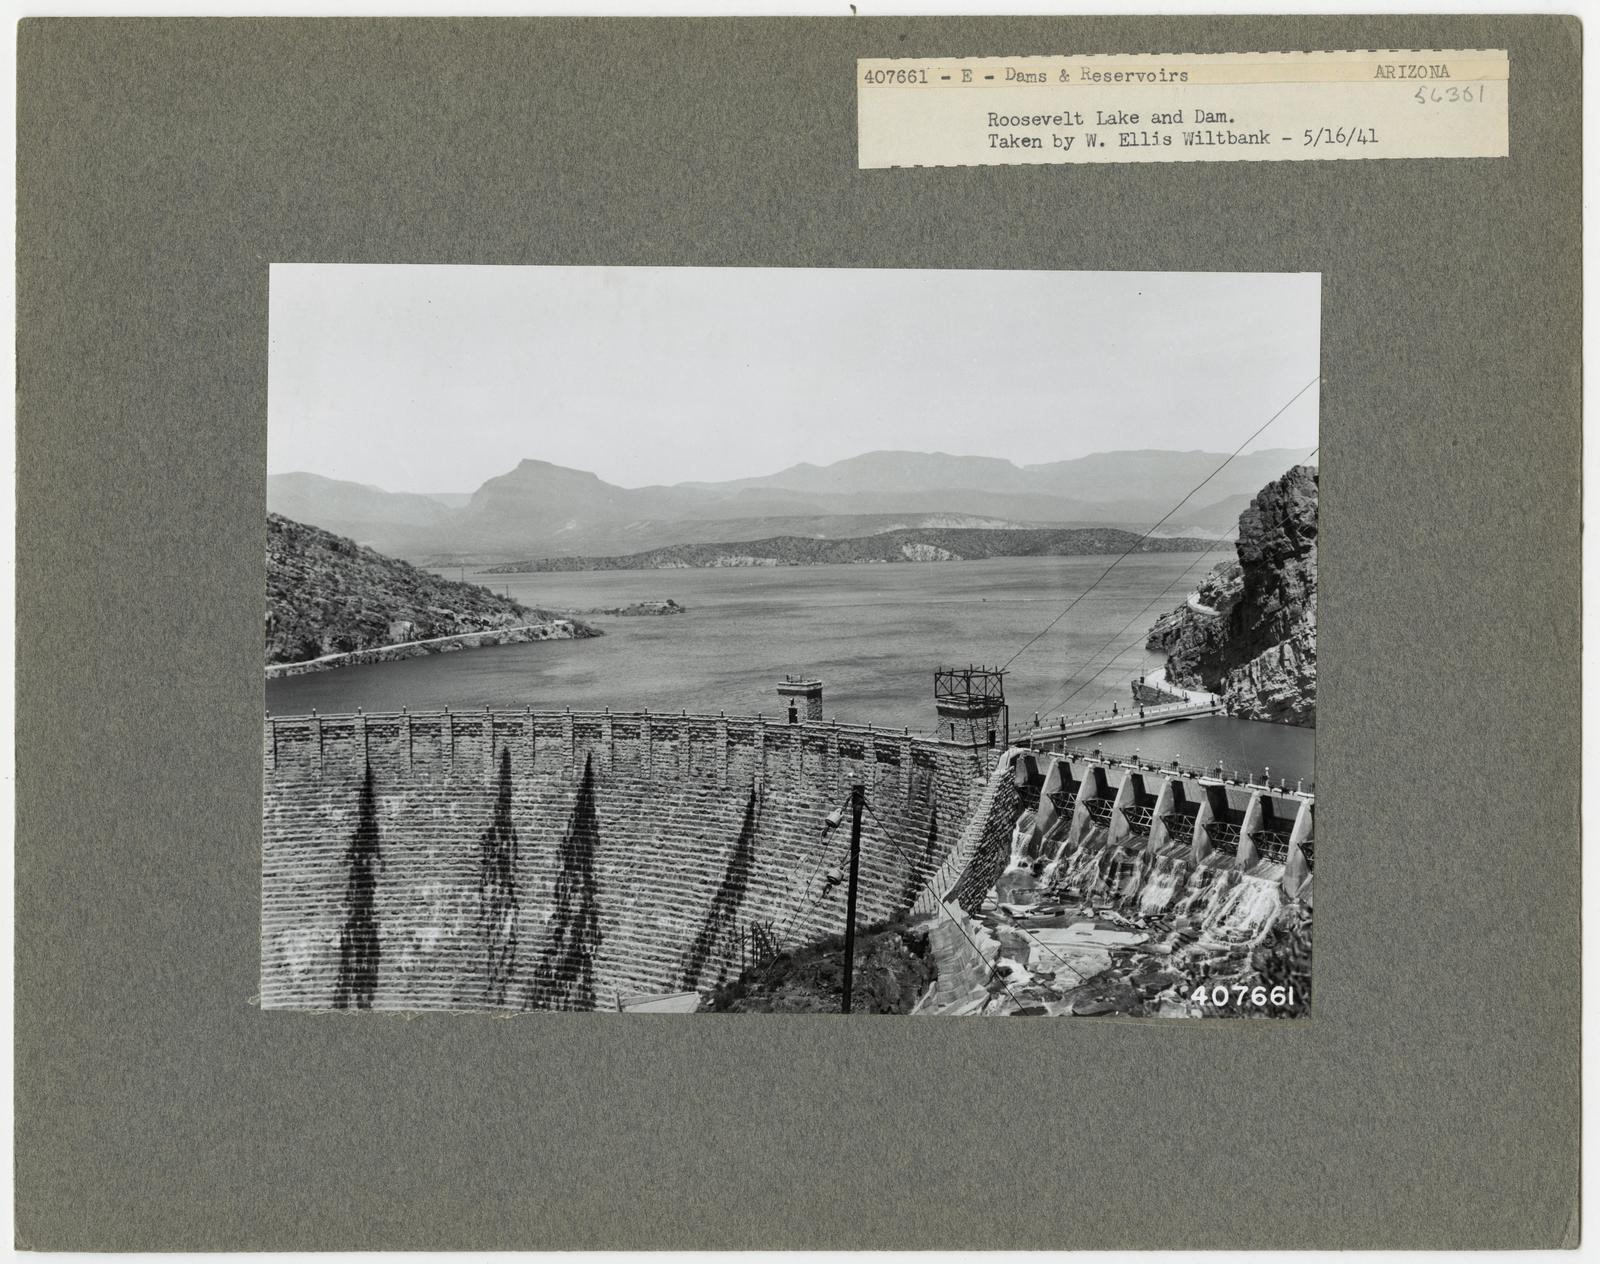 Dams - All States